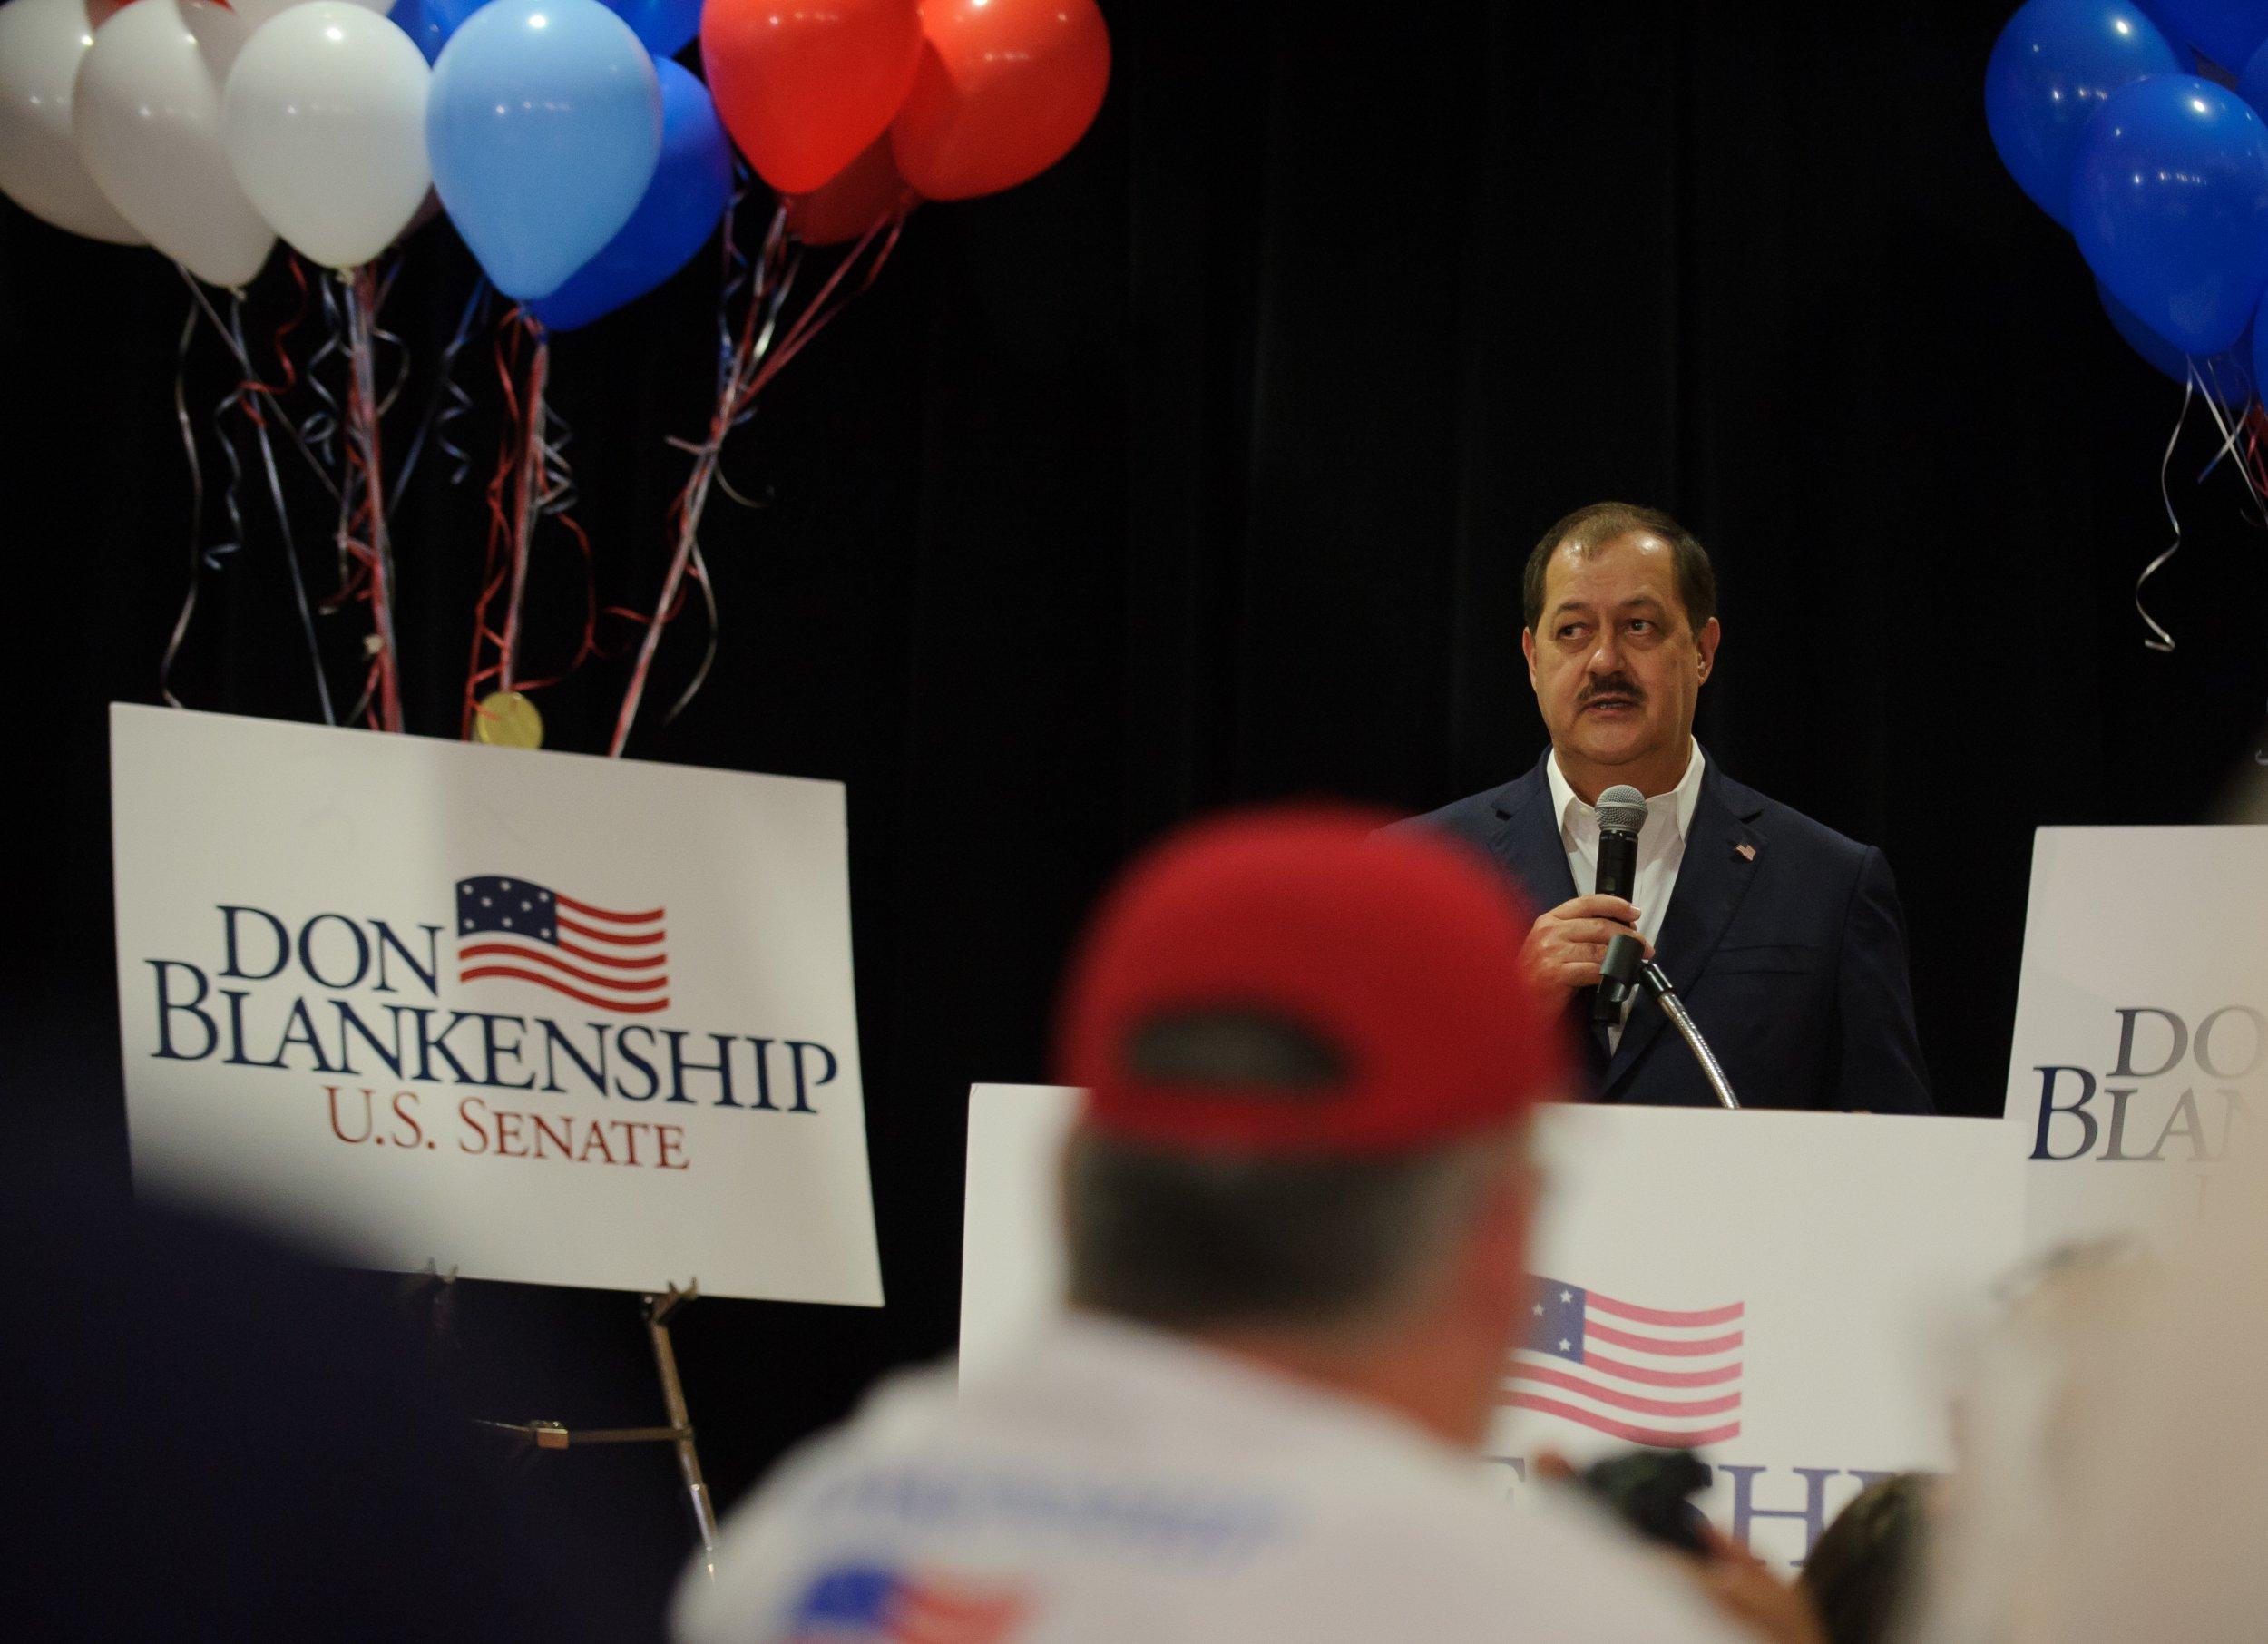 Don Blankenship